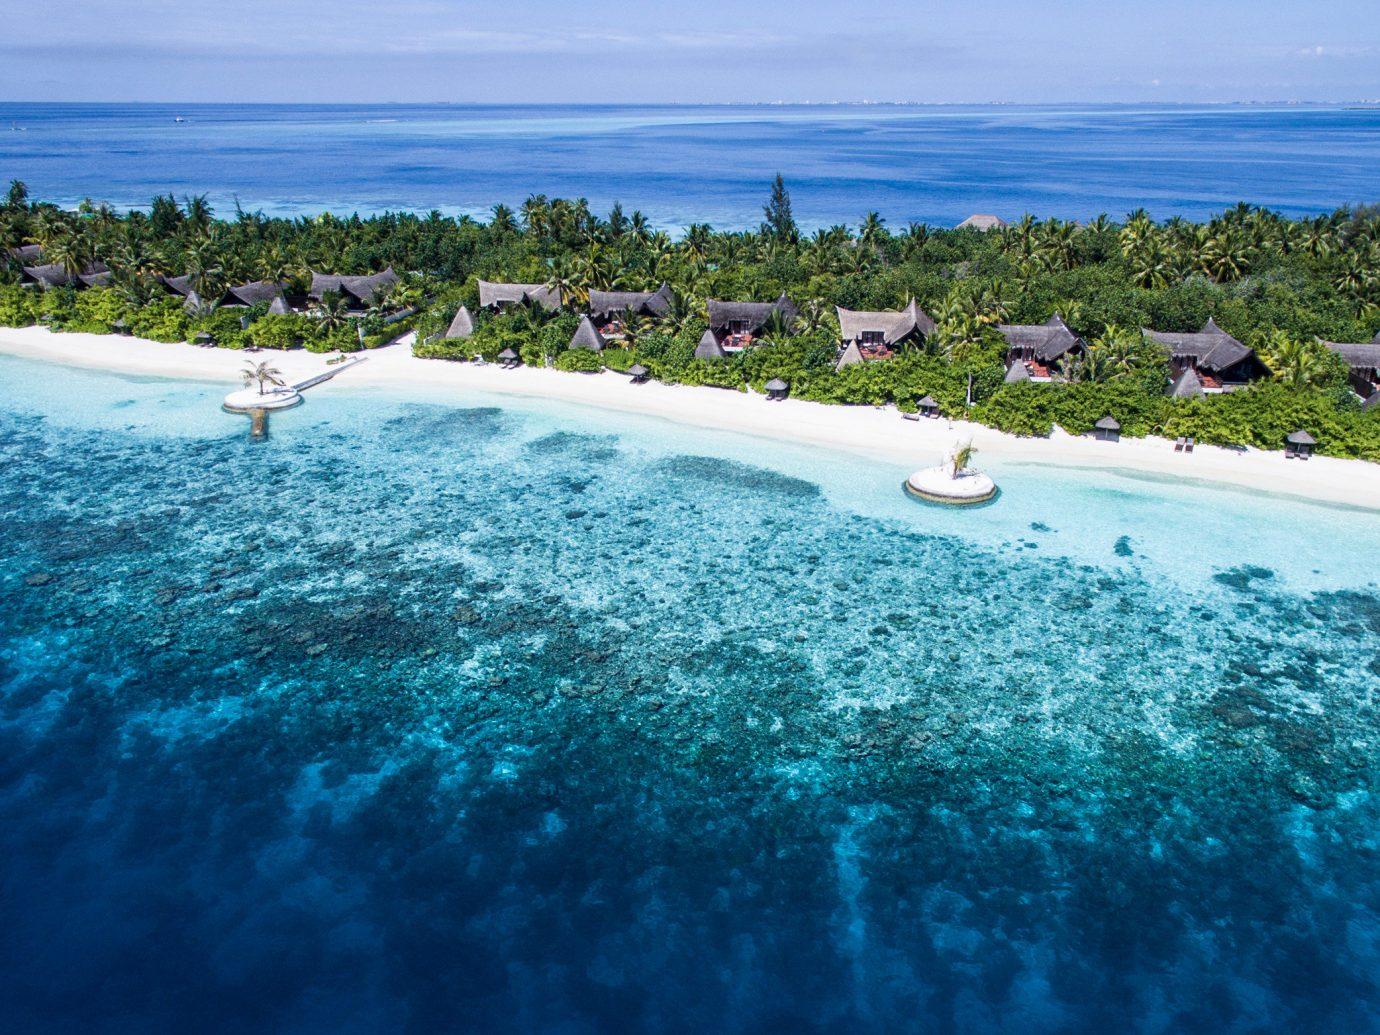 Hotels sky water Nature reef Sea outdoor Ocean shore horizon Beach caribbean swimming pool vacation Coast Lagoon bay Island wave cape tropics islet atoll archipelago day